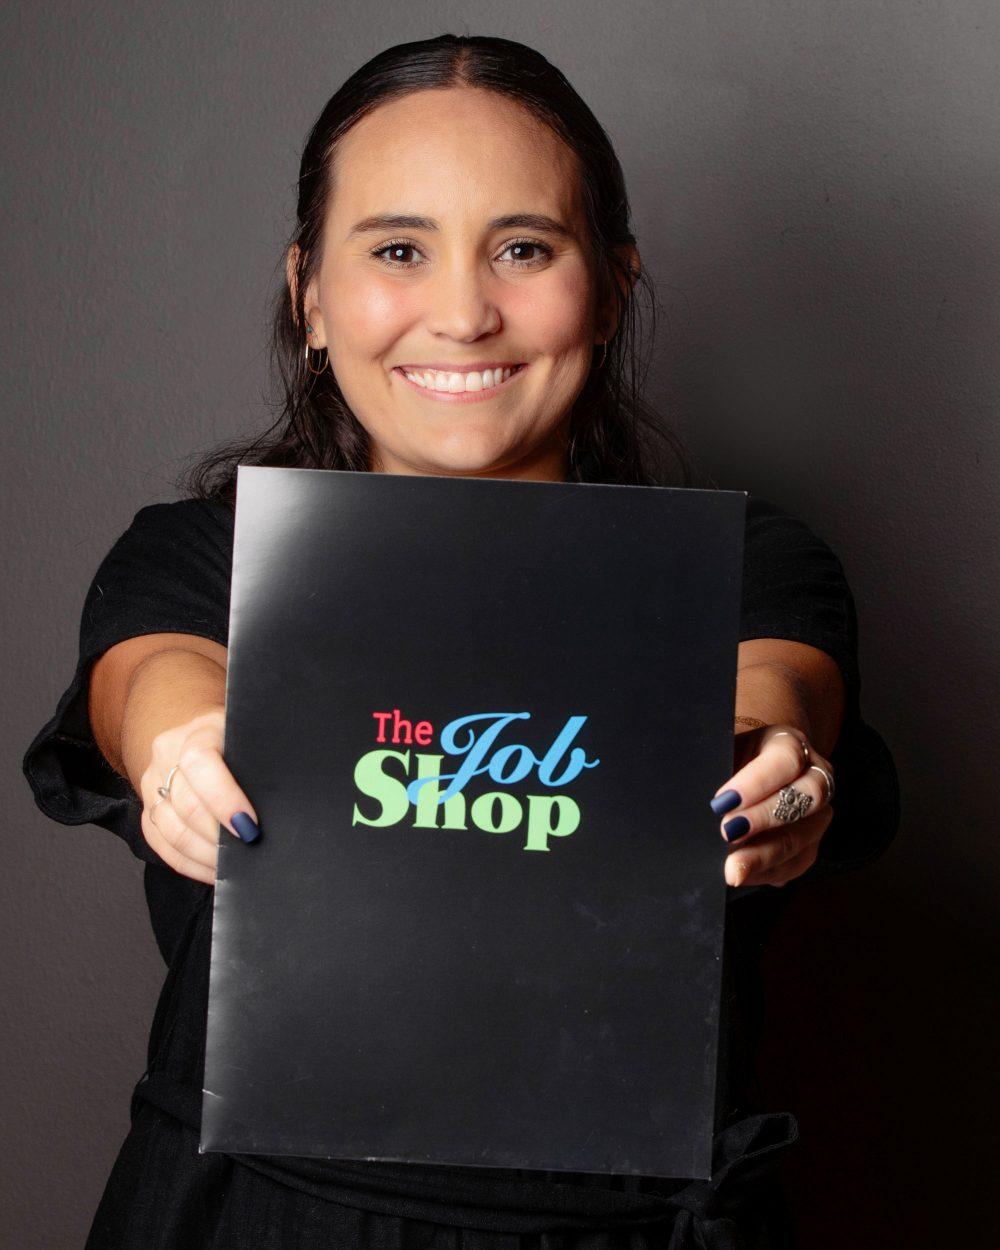 JobShop_Pooja Photography San francisco recruiters branding Liz Frome